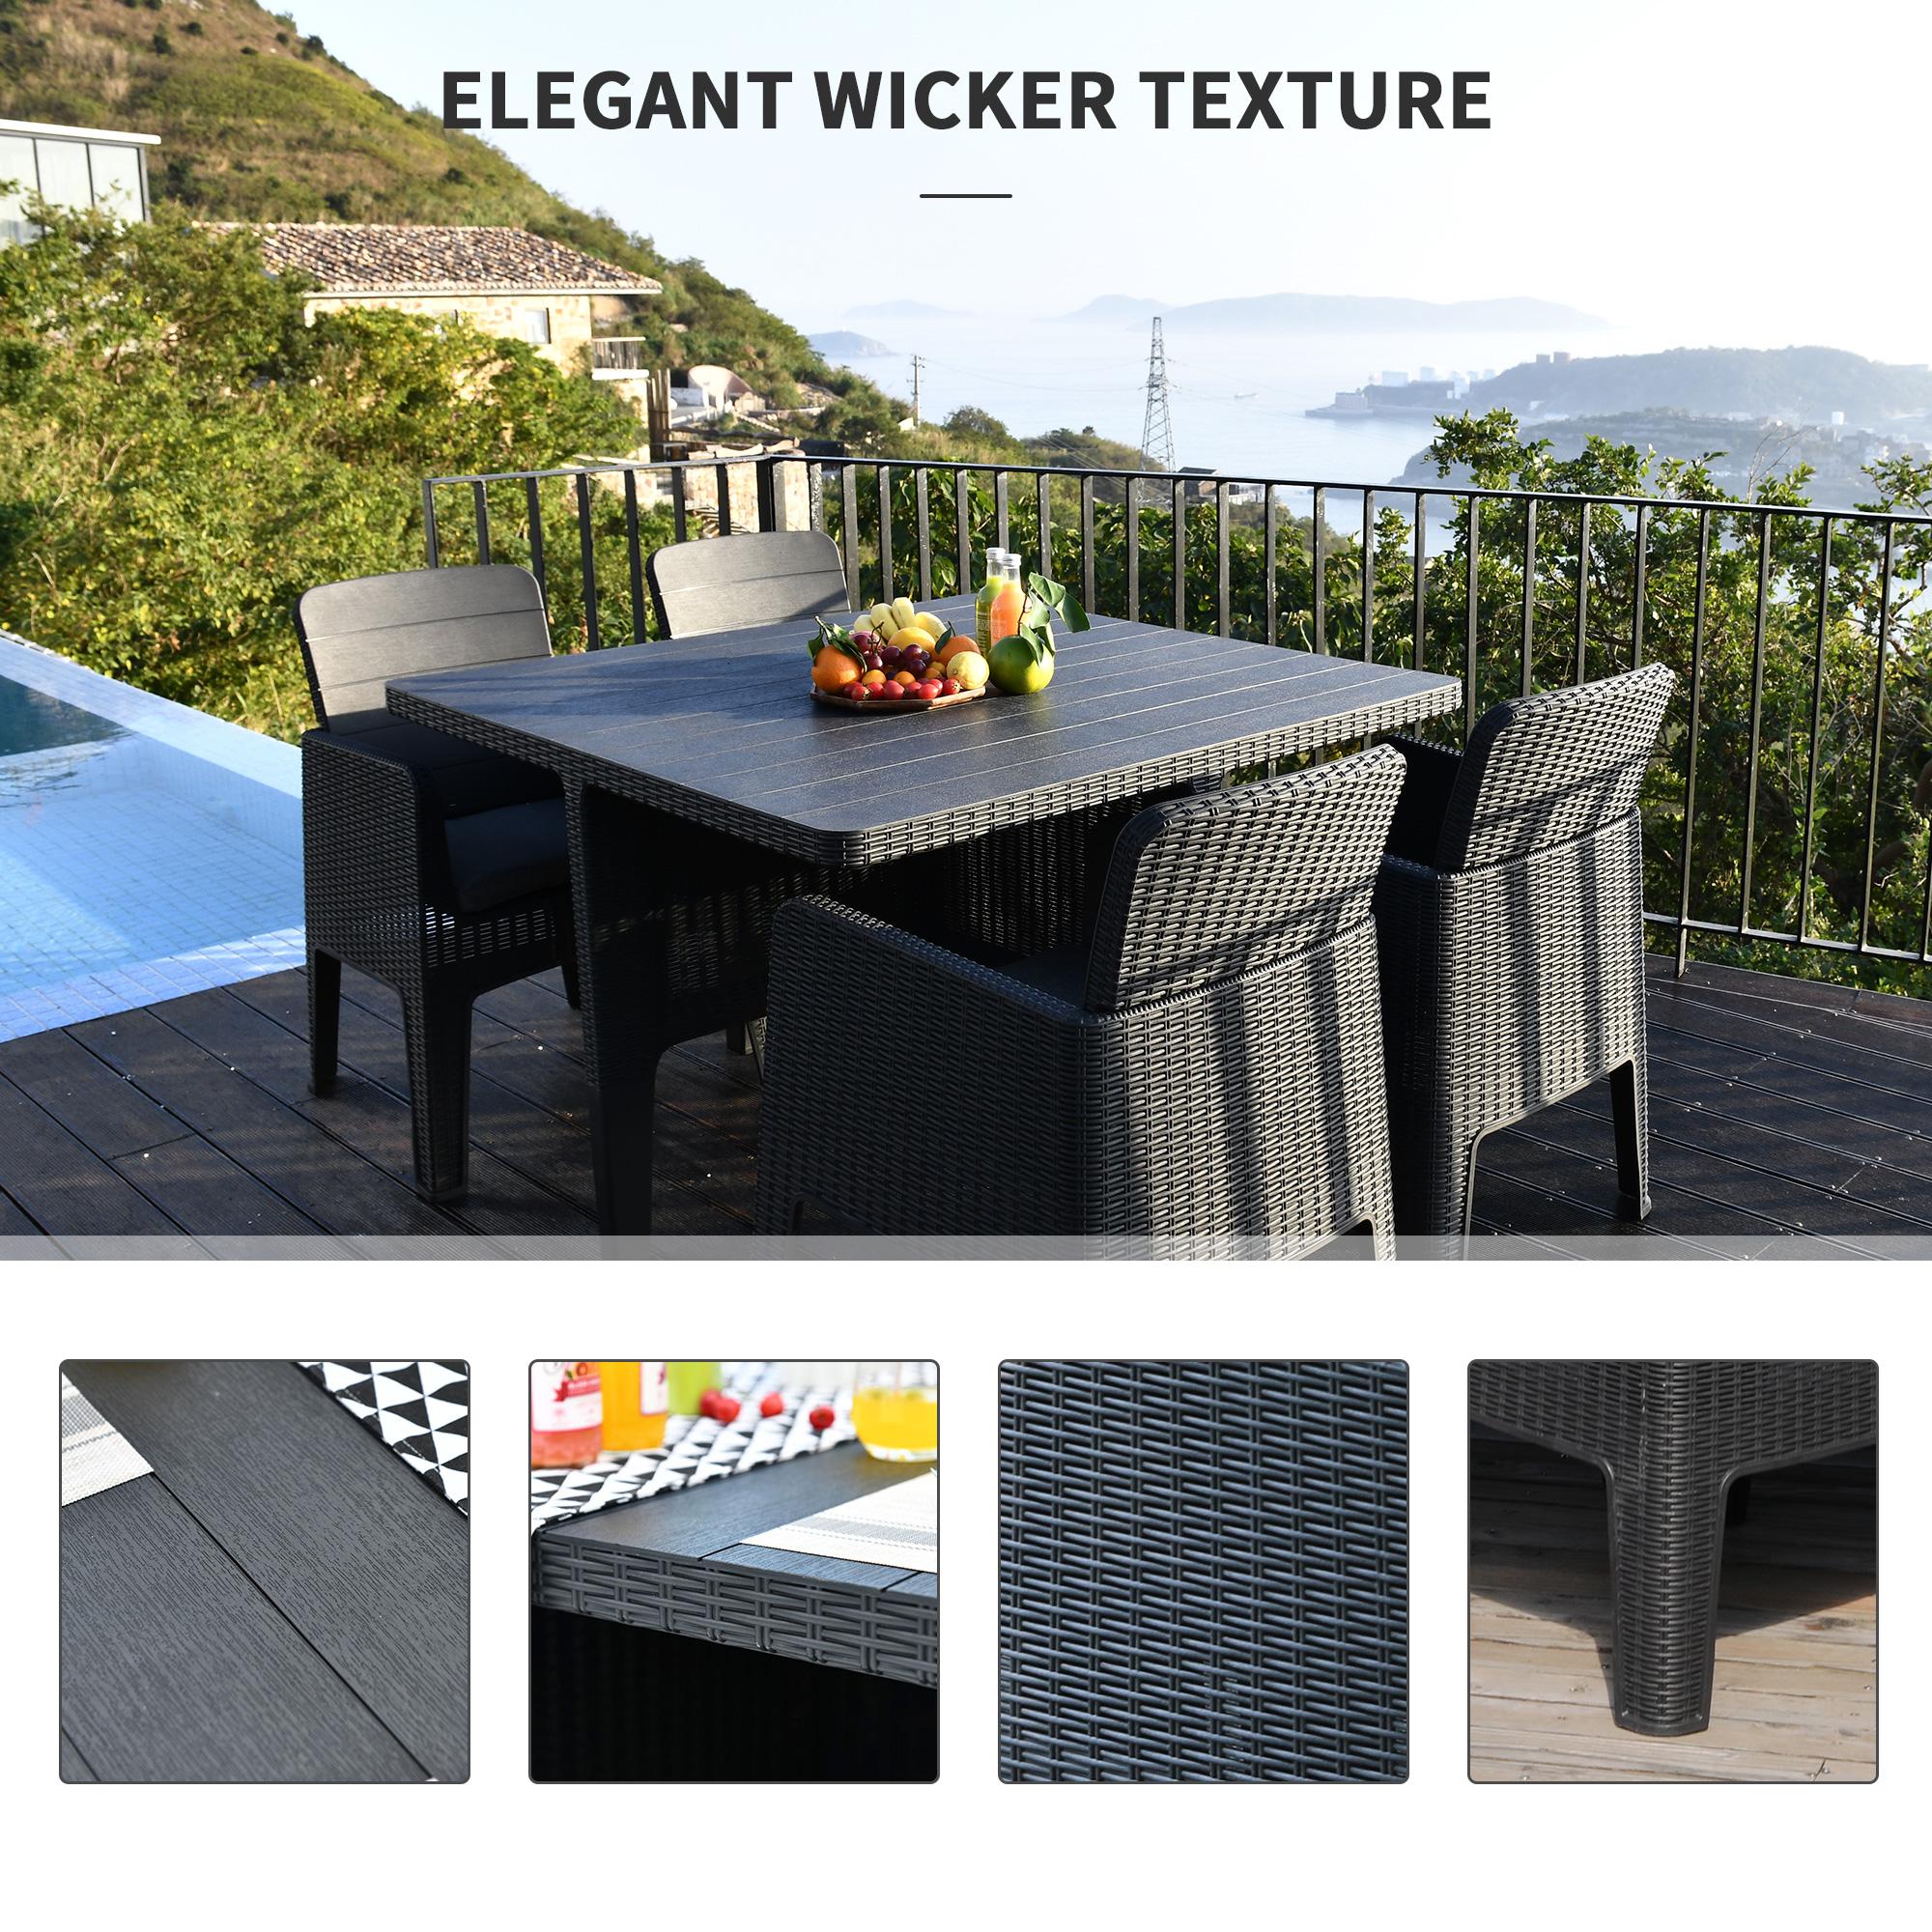 Outsunny 5 PCS Outdoor PP Rattan Garden Dining Cube Set ...